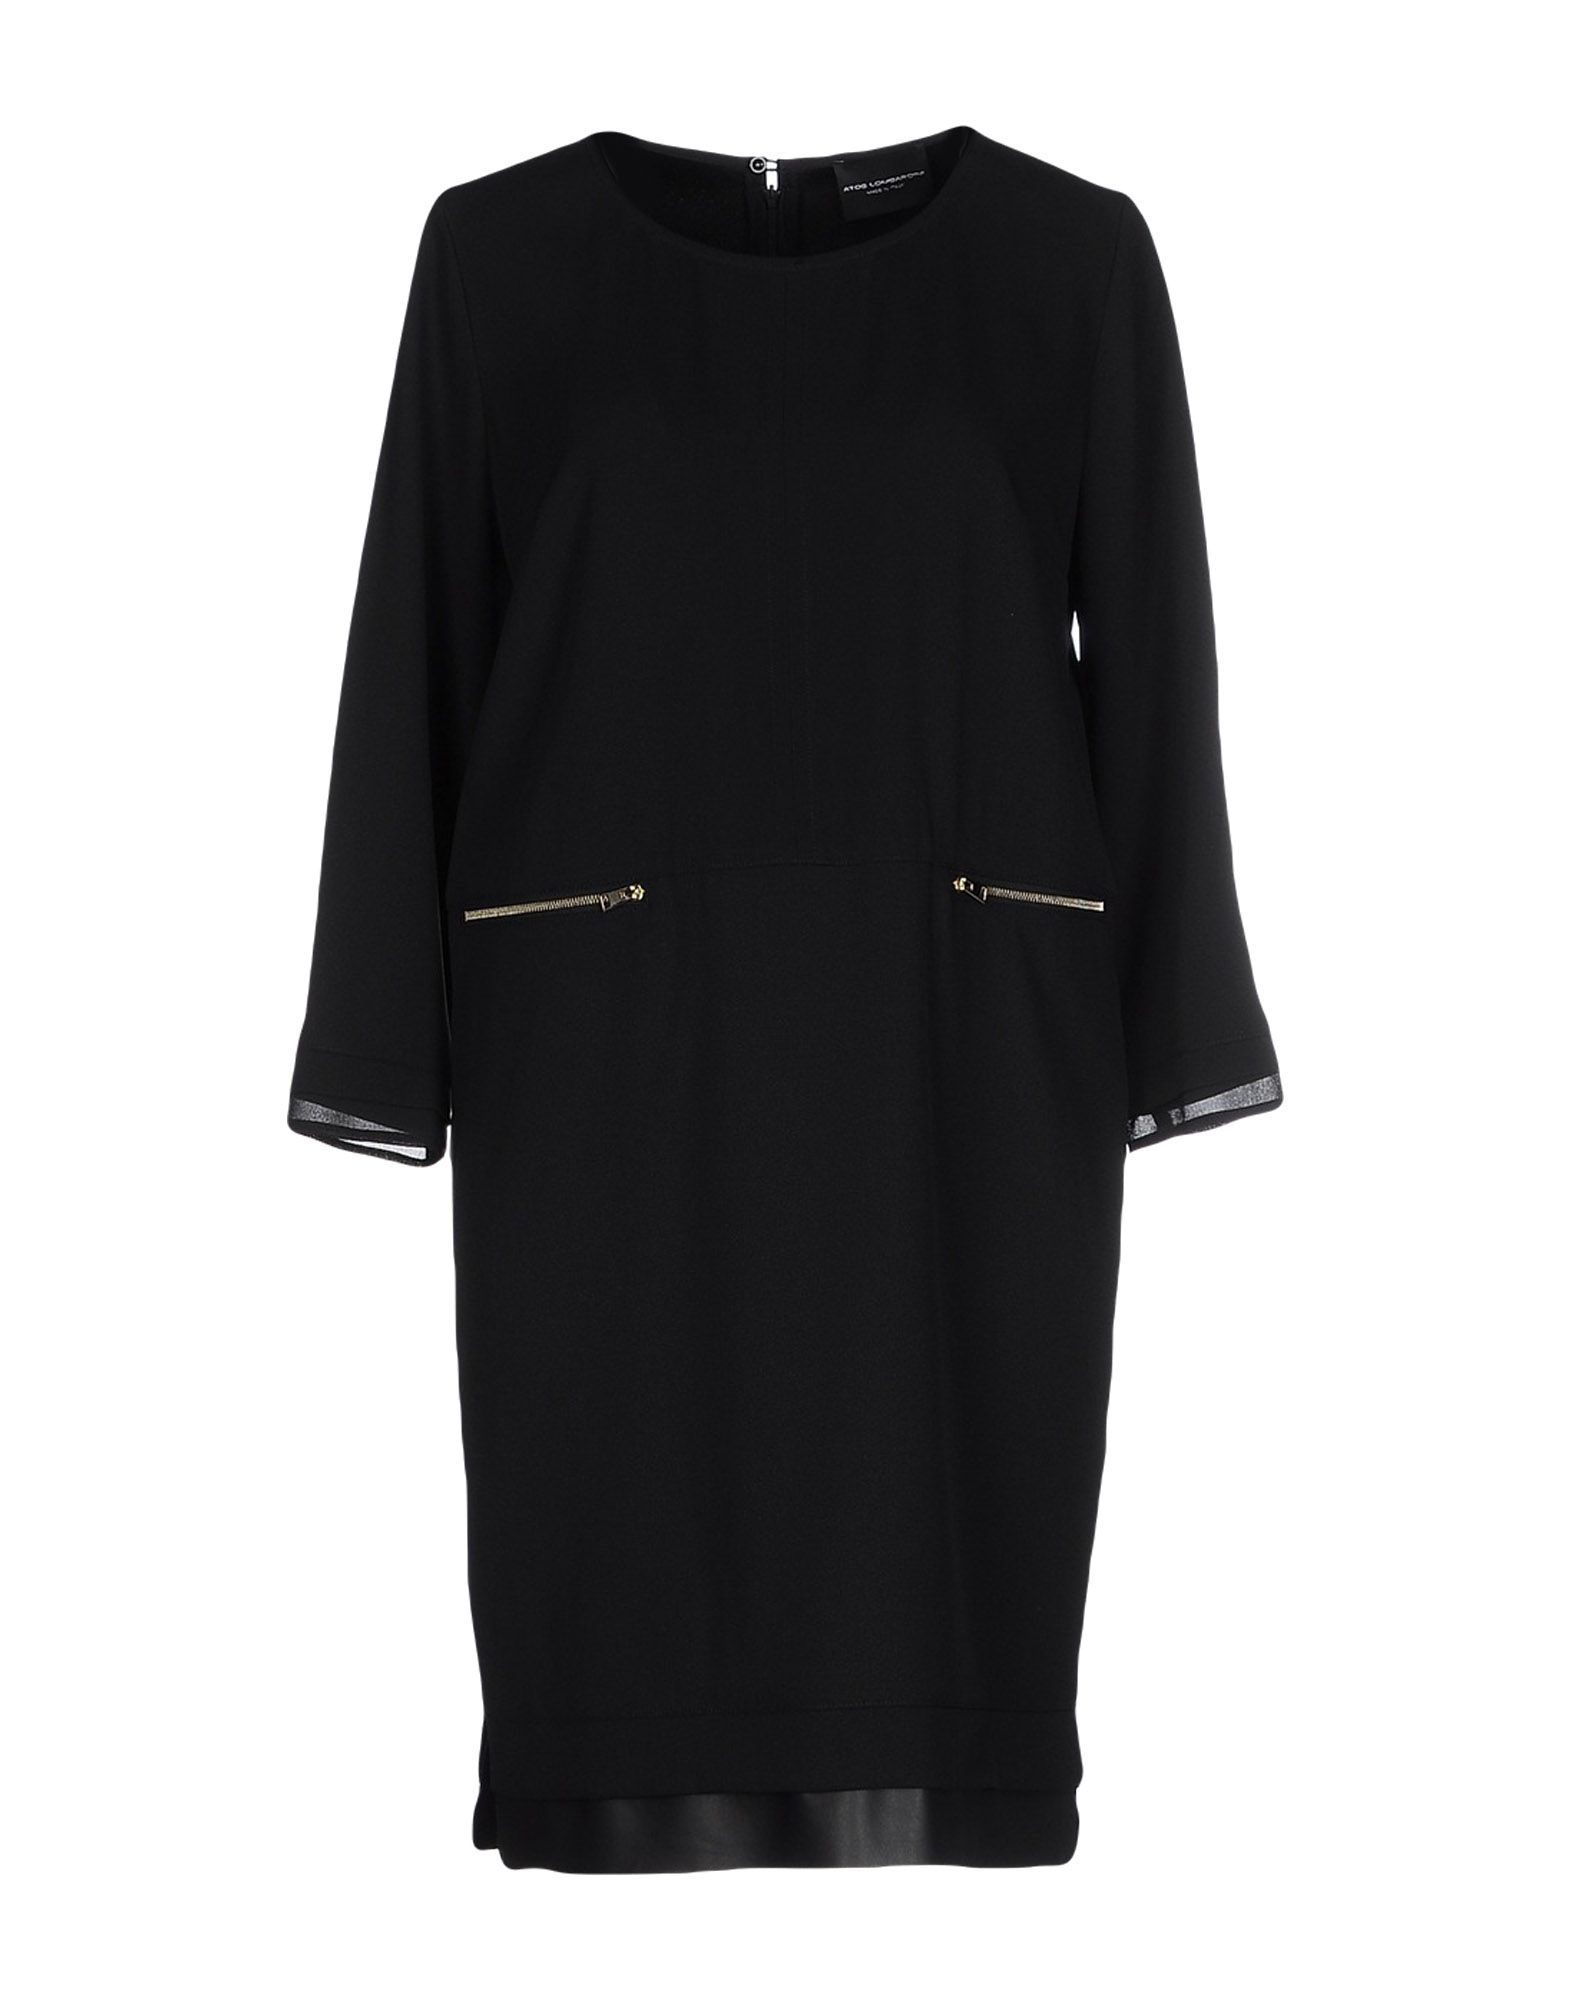 ATOS LOMBARDINI Damen Kurzes Kleid Farbe Schwarz Größe 6